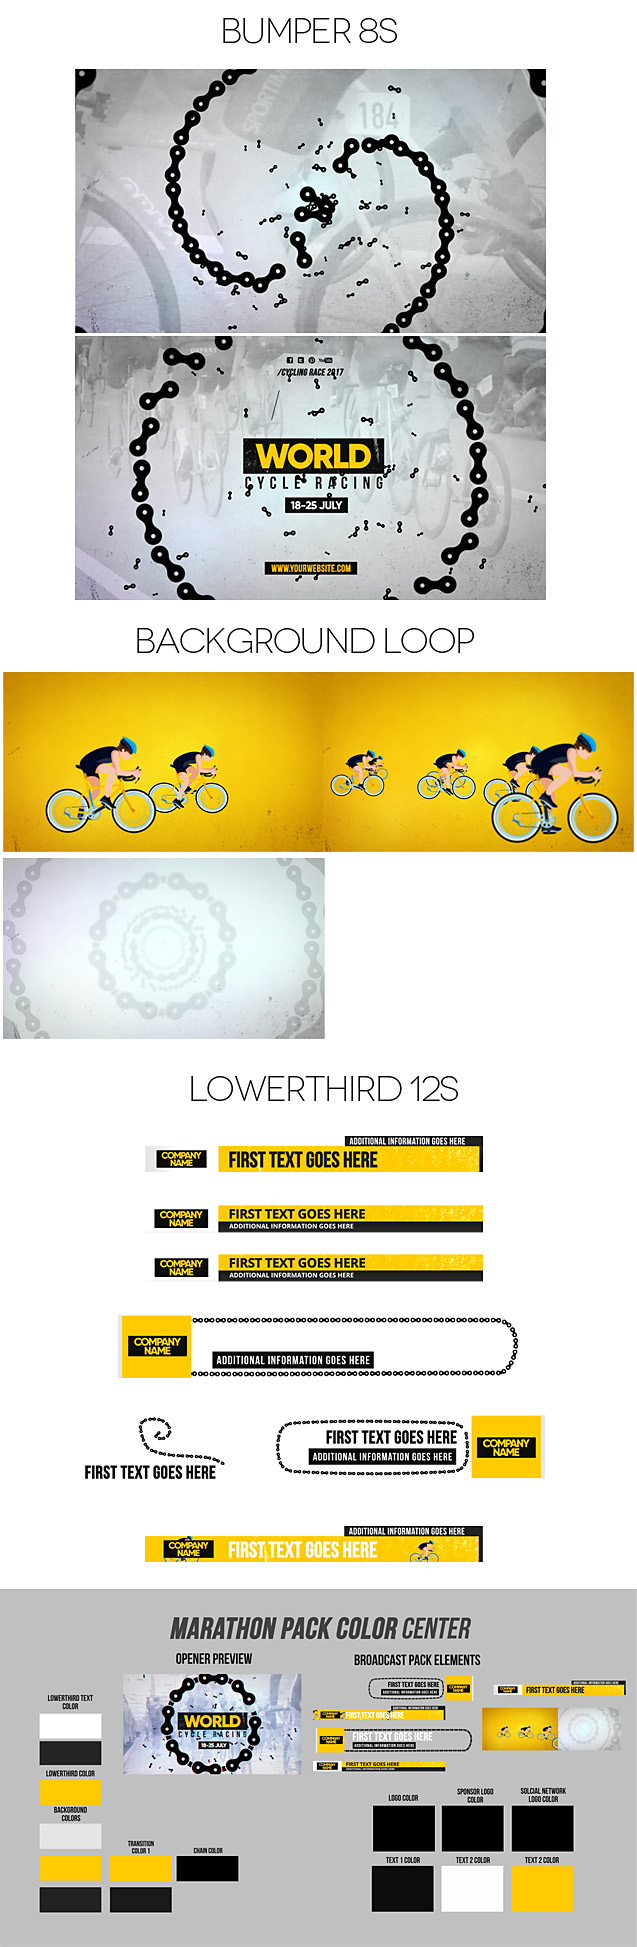 World Cycling Marathon Pack - 2